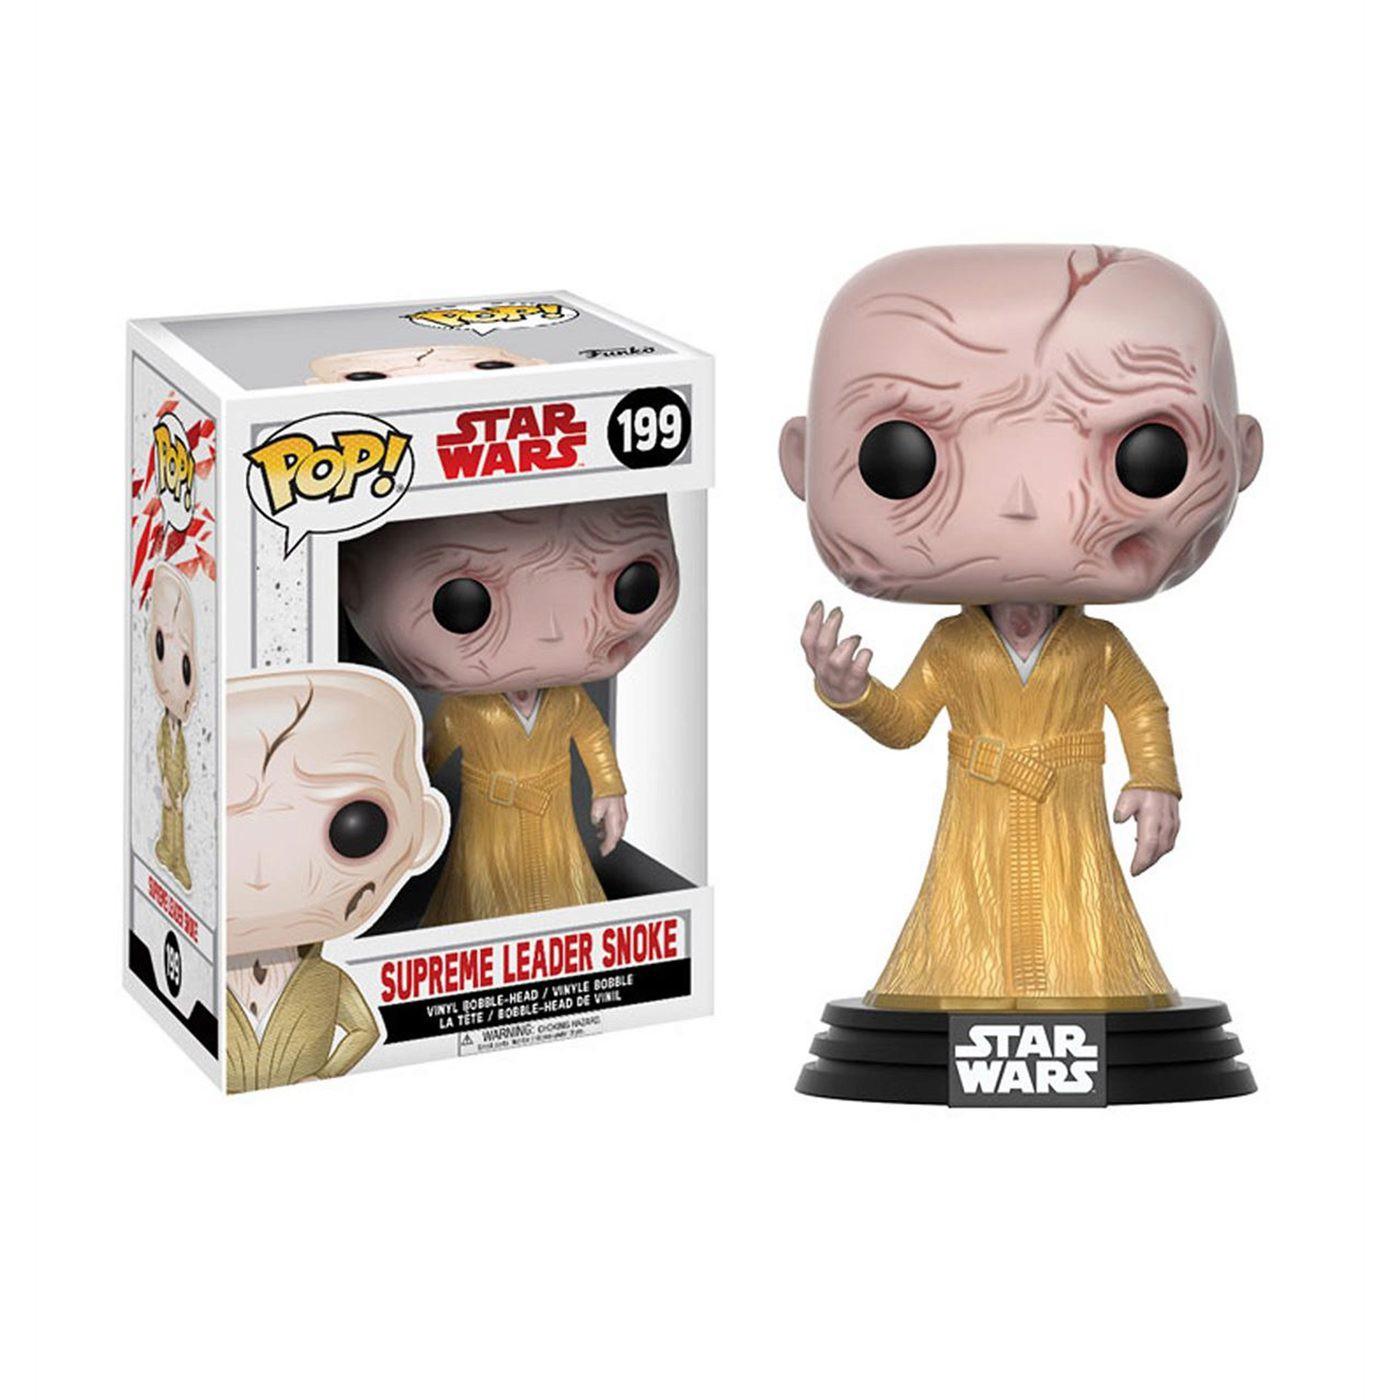 Star Wars Last Jedi Supreme Leader Snoke Pop Bobble Head